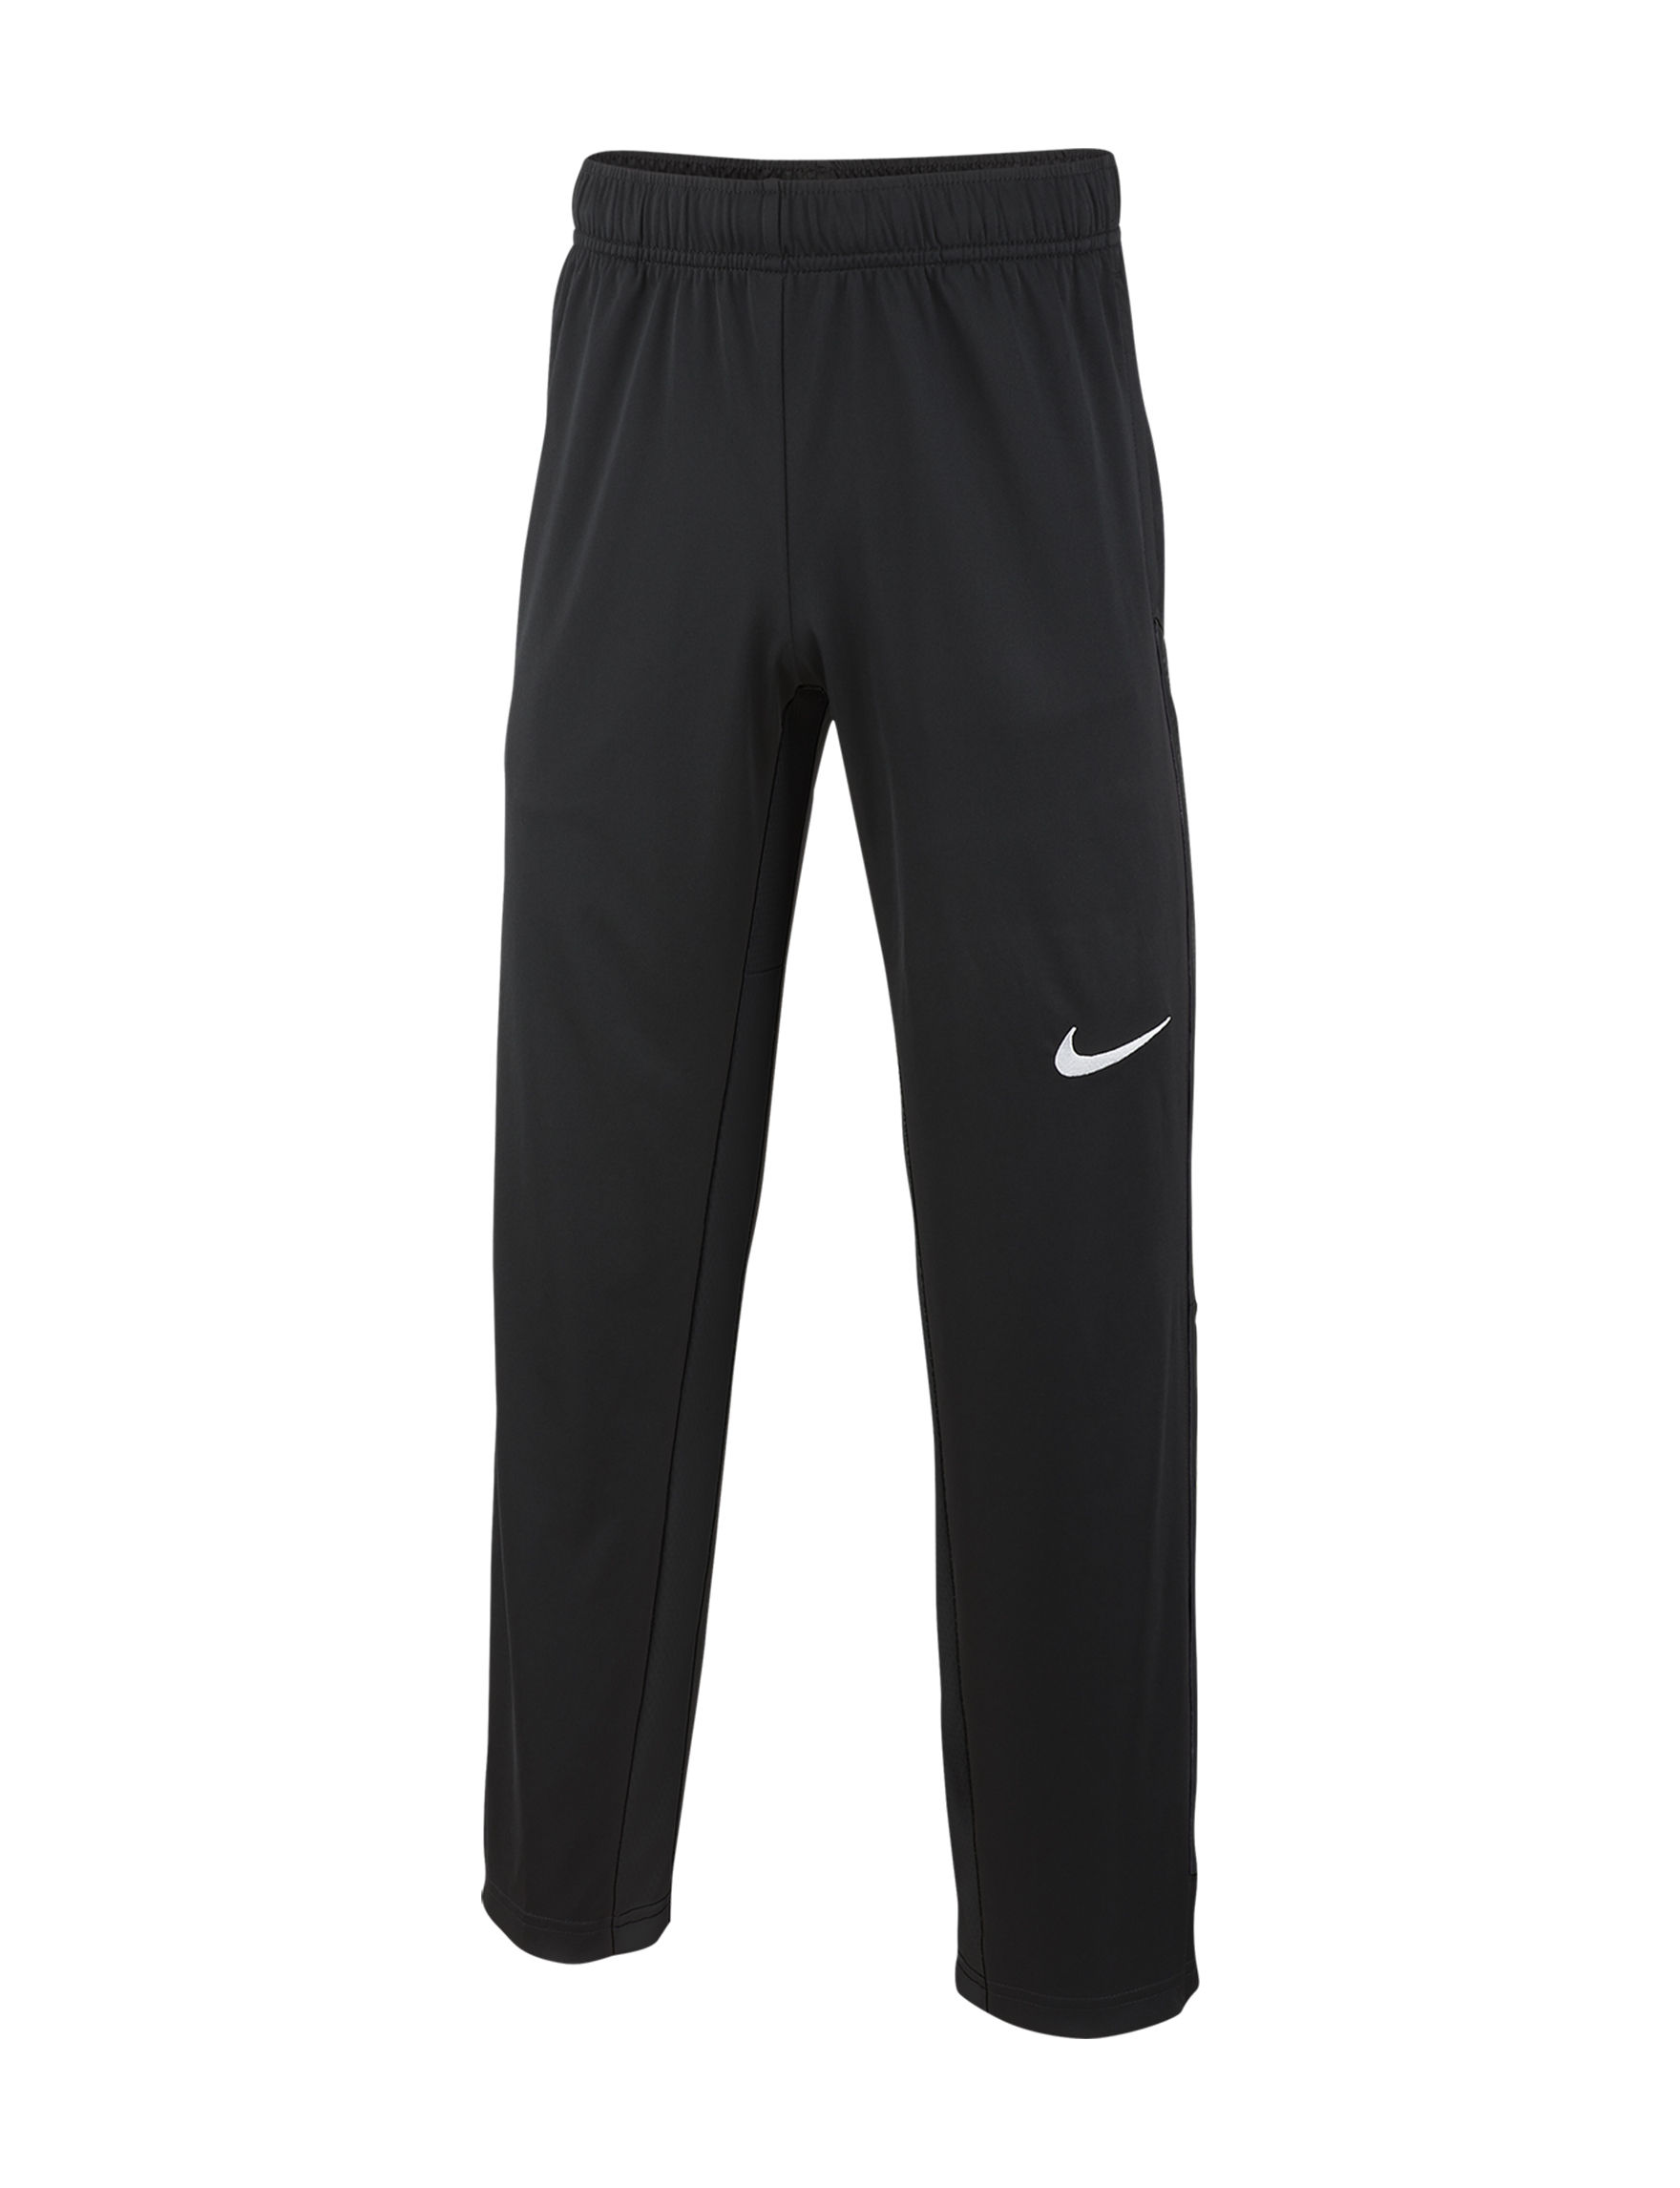 Nike Black Stretch